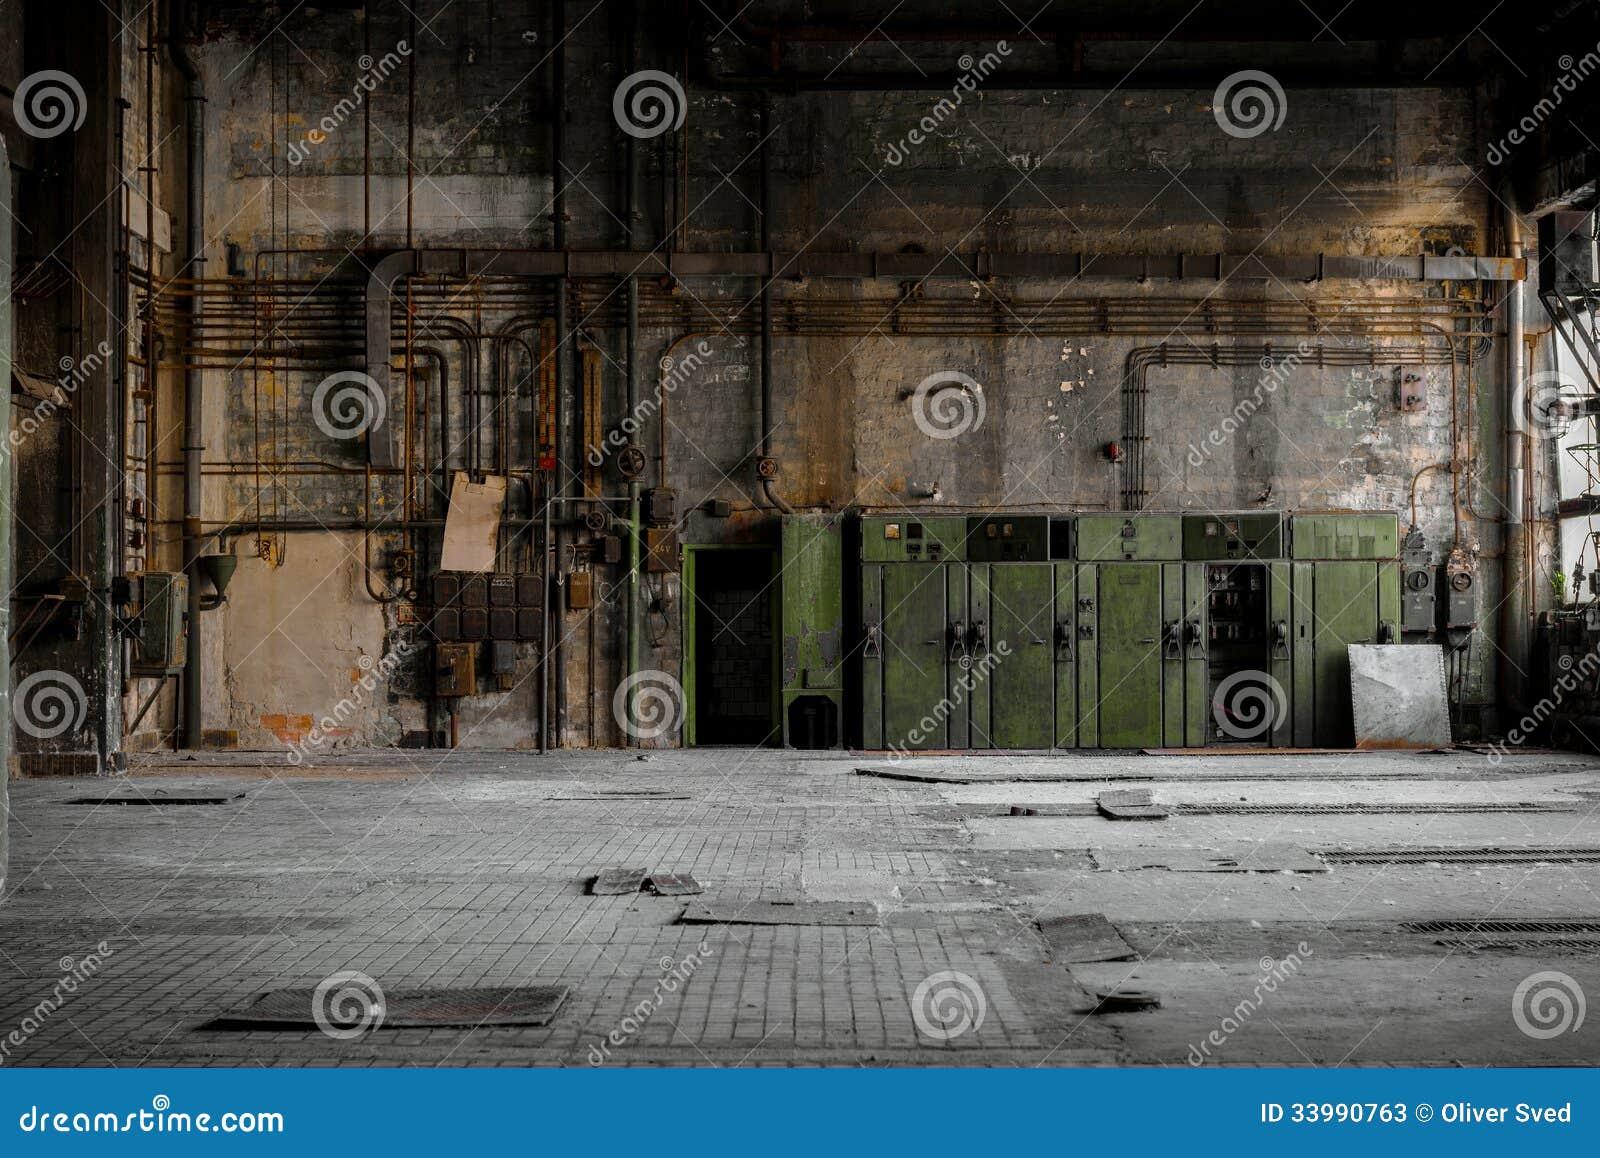 industrial fuse boxes stock image image of destroyed 33990763 rh dreamstime com